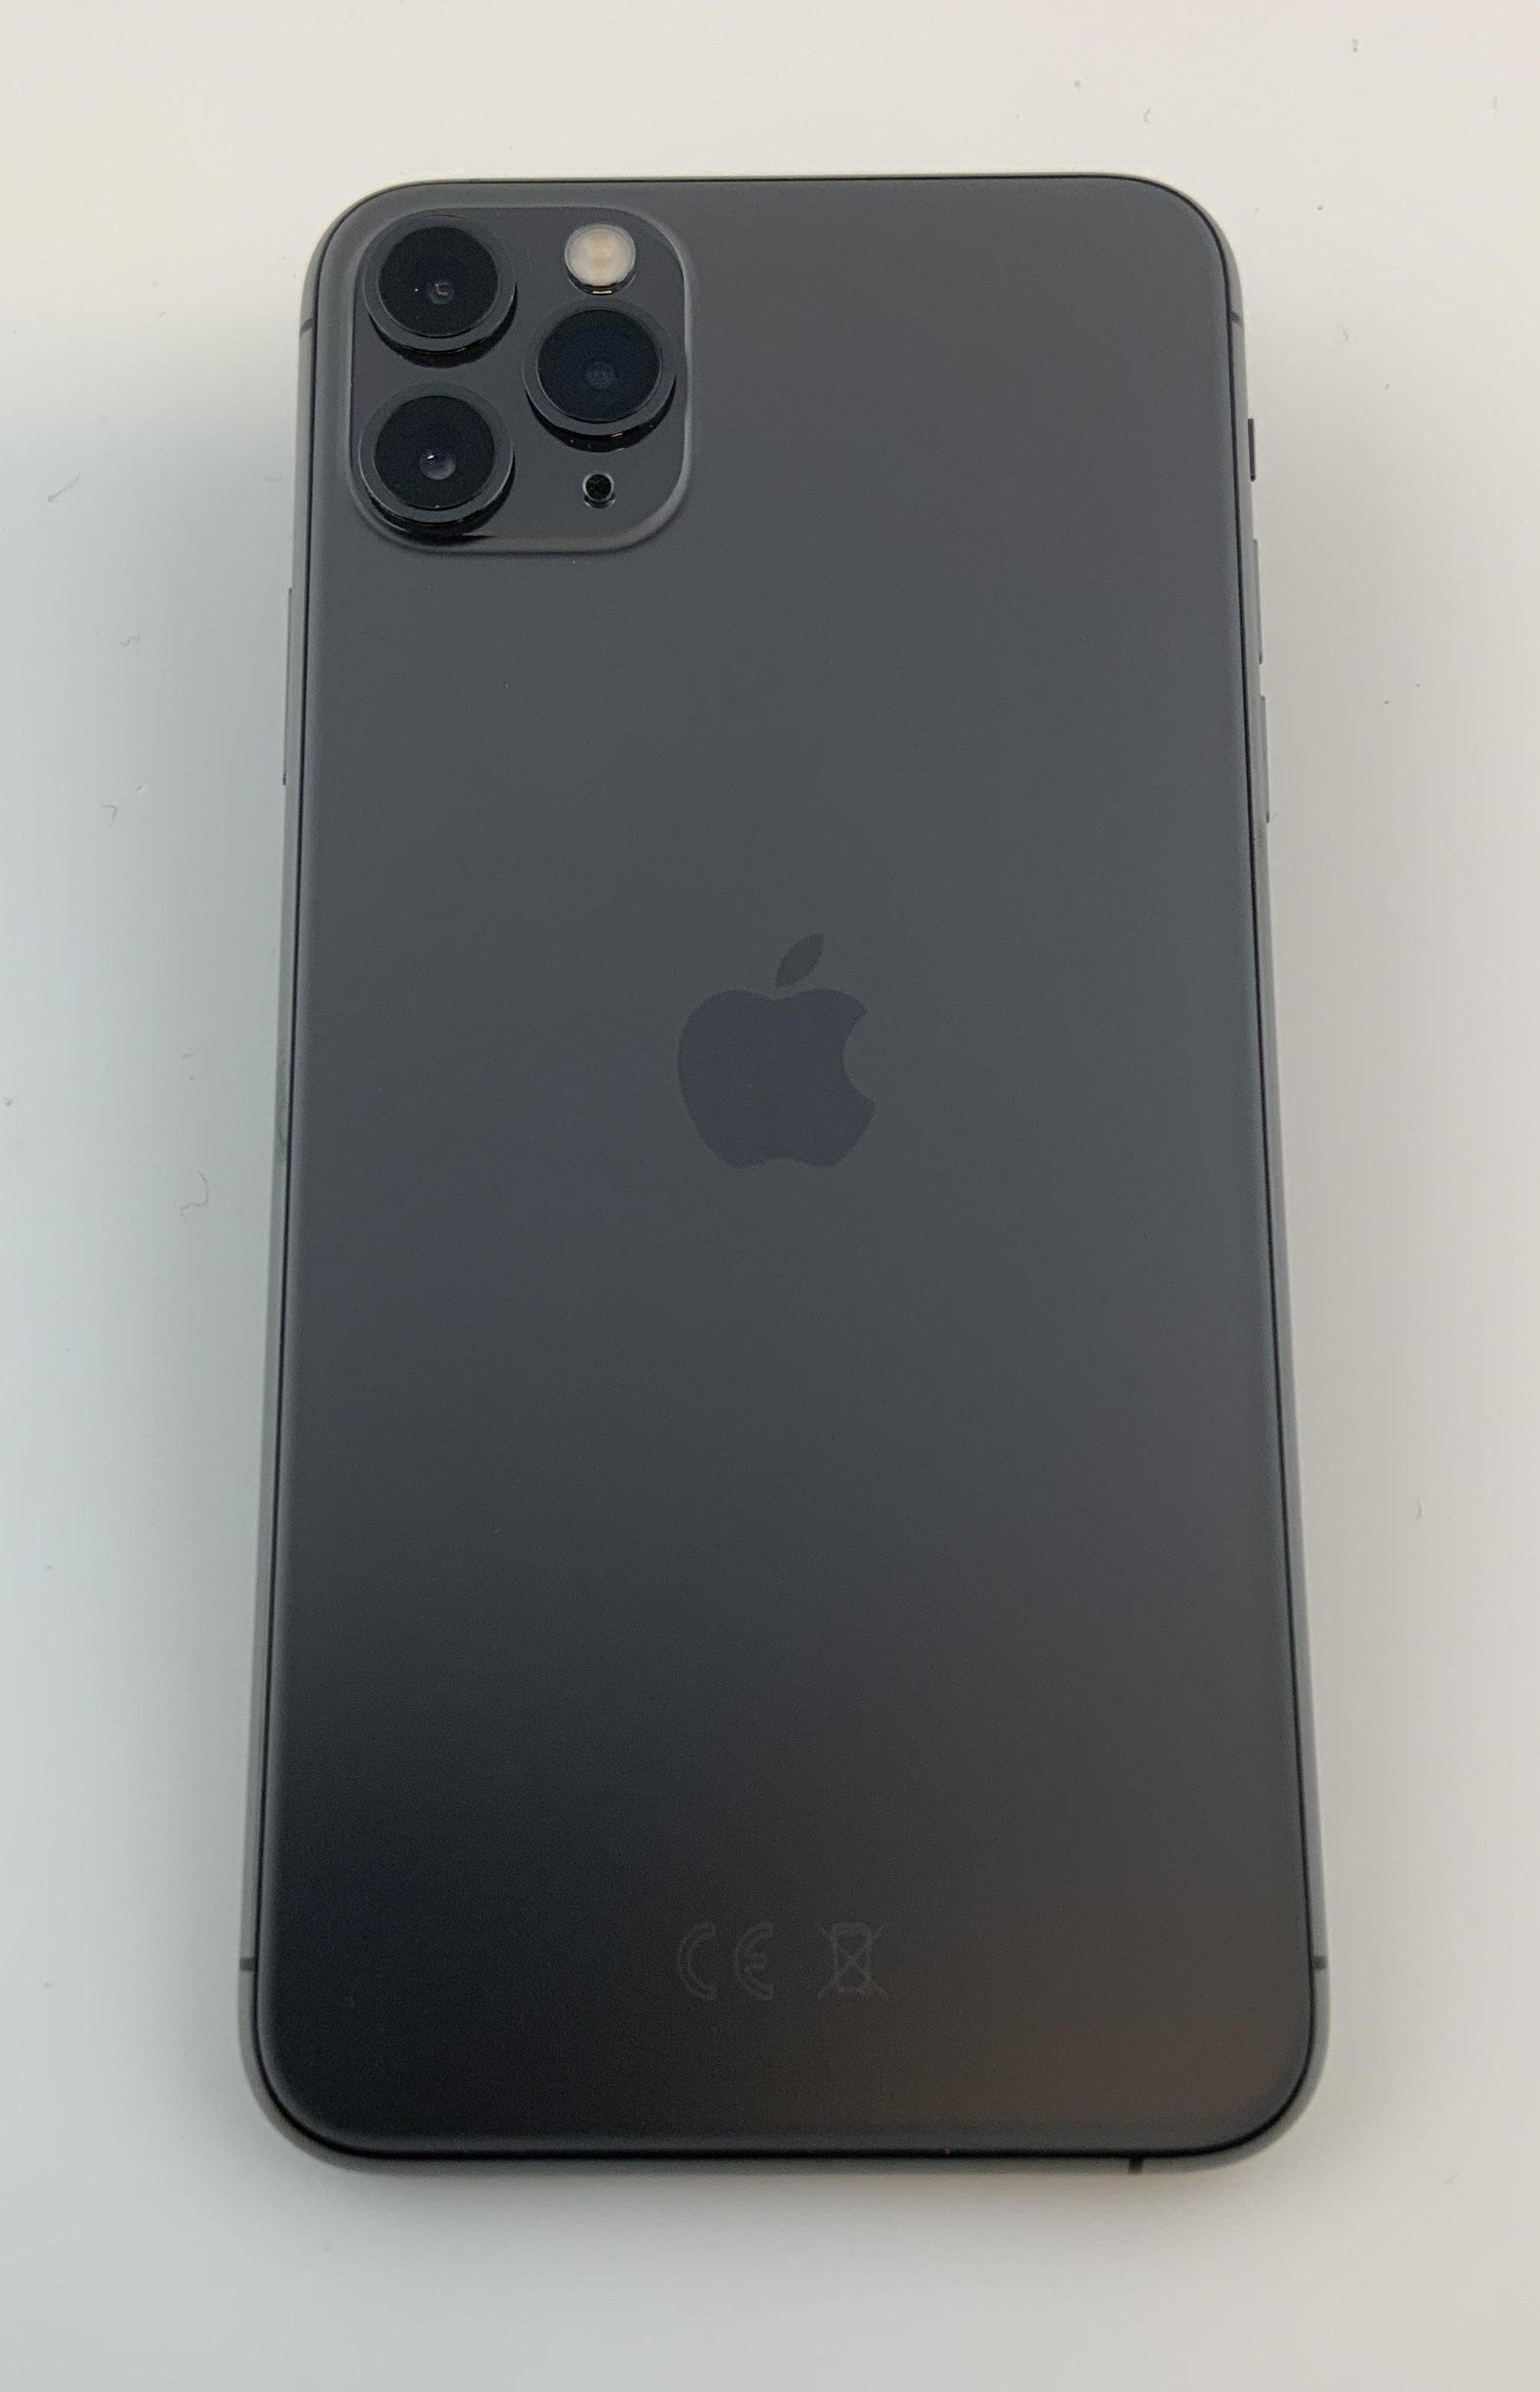 iPhone 11 Pro Max 512GB, 512GB, Space Gray, image 2